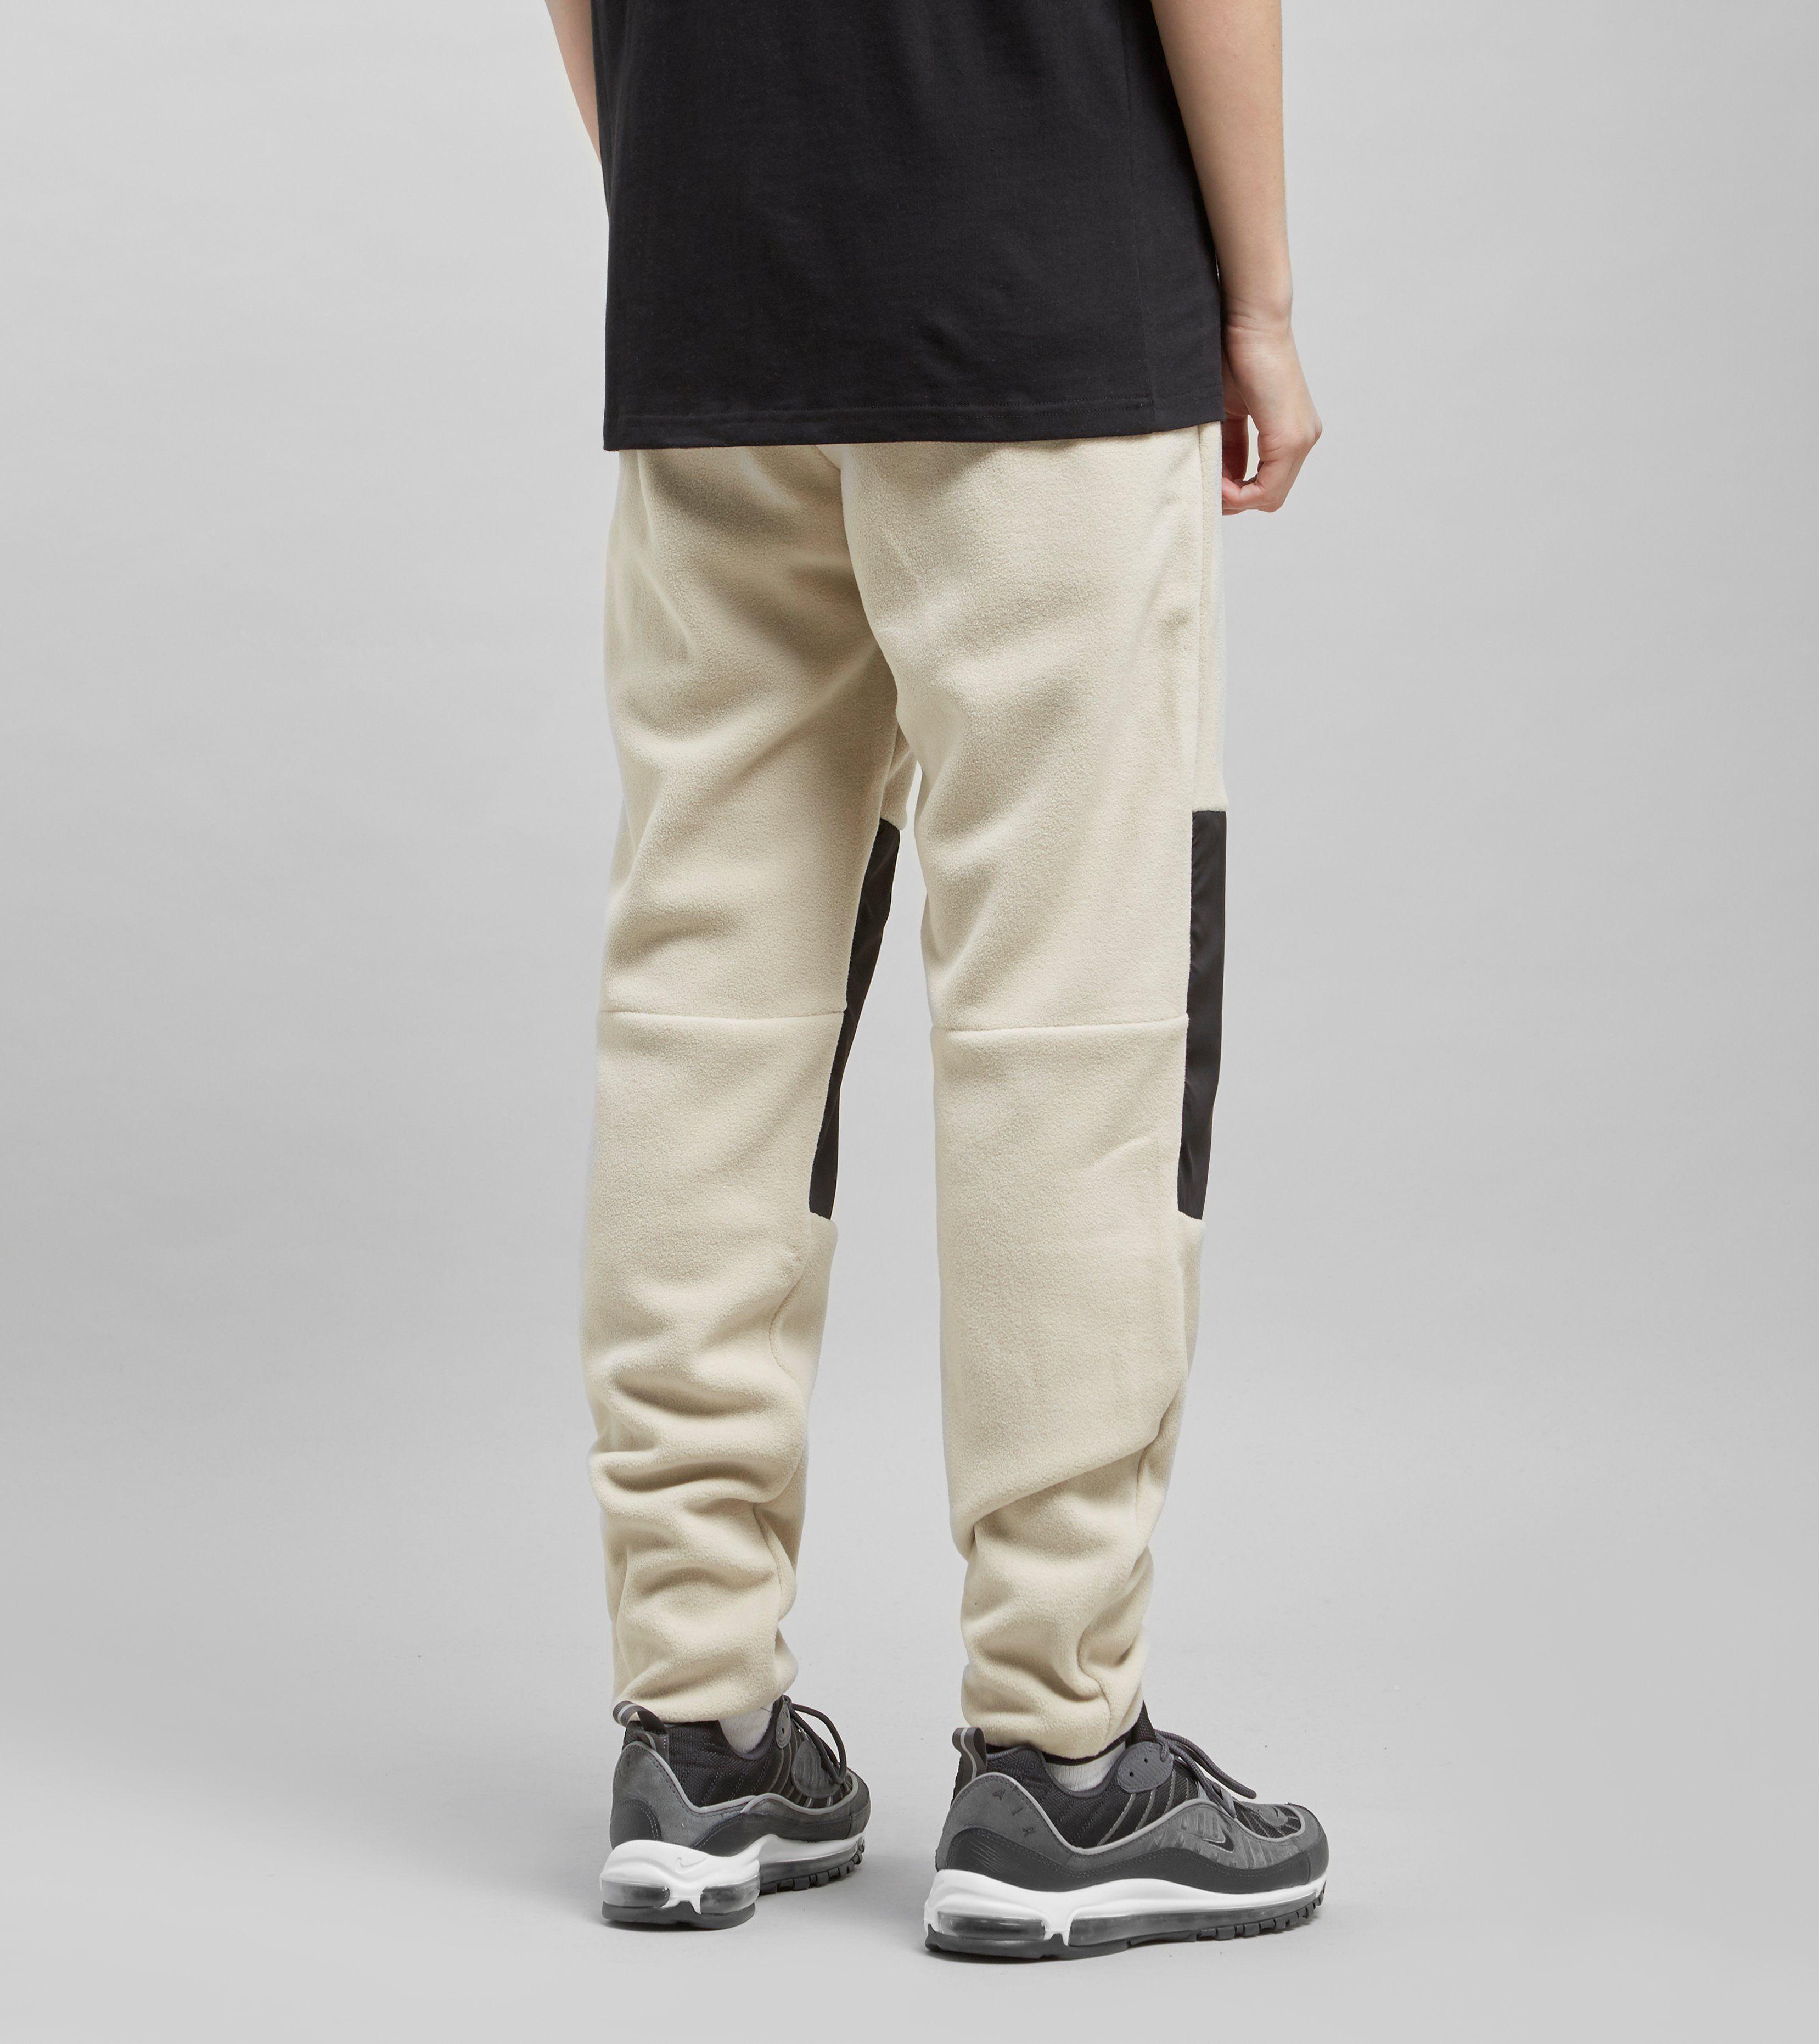 Fila Passo Fleece Pants